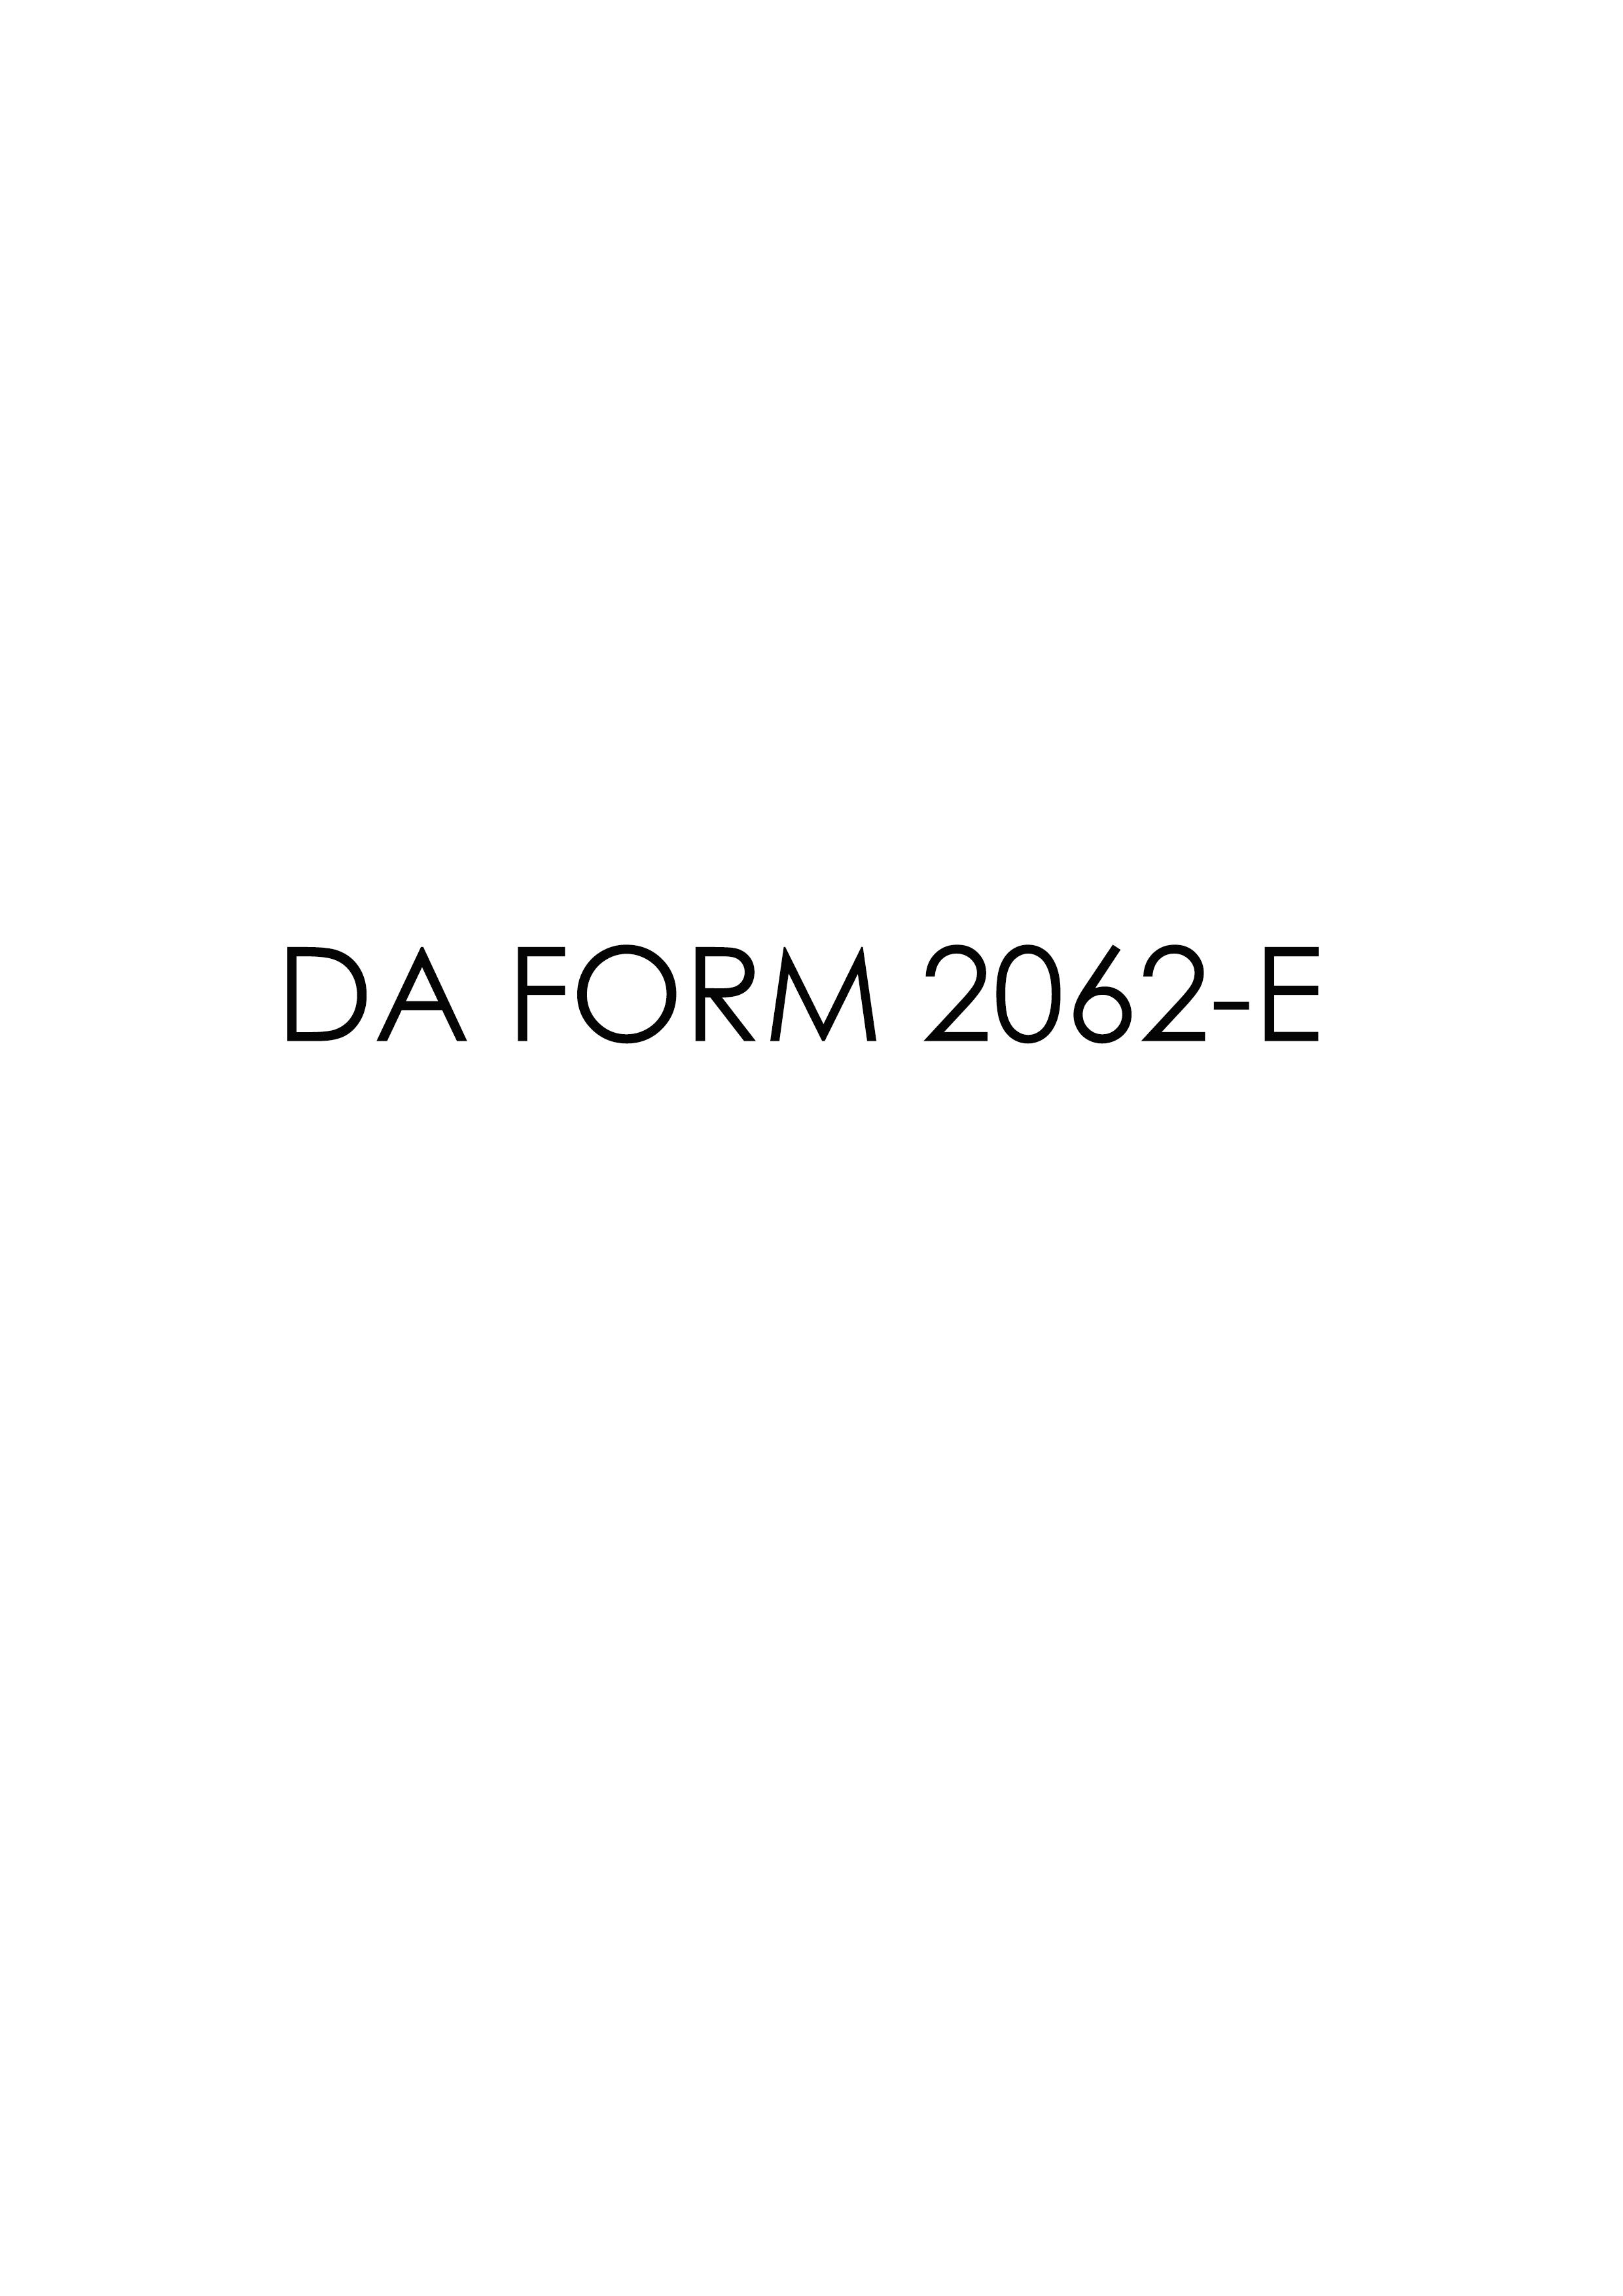 Download da Form 2062-E Free